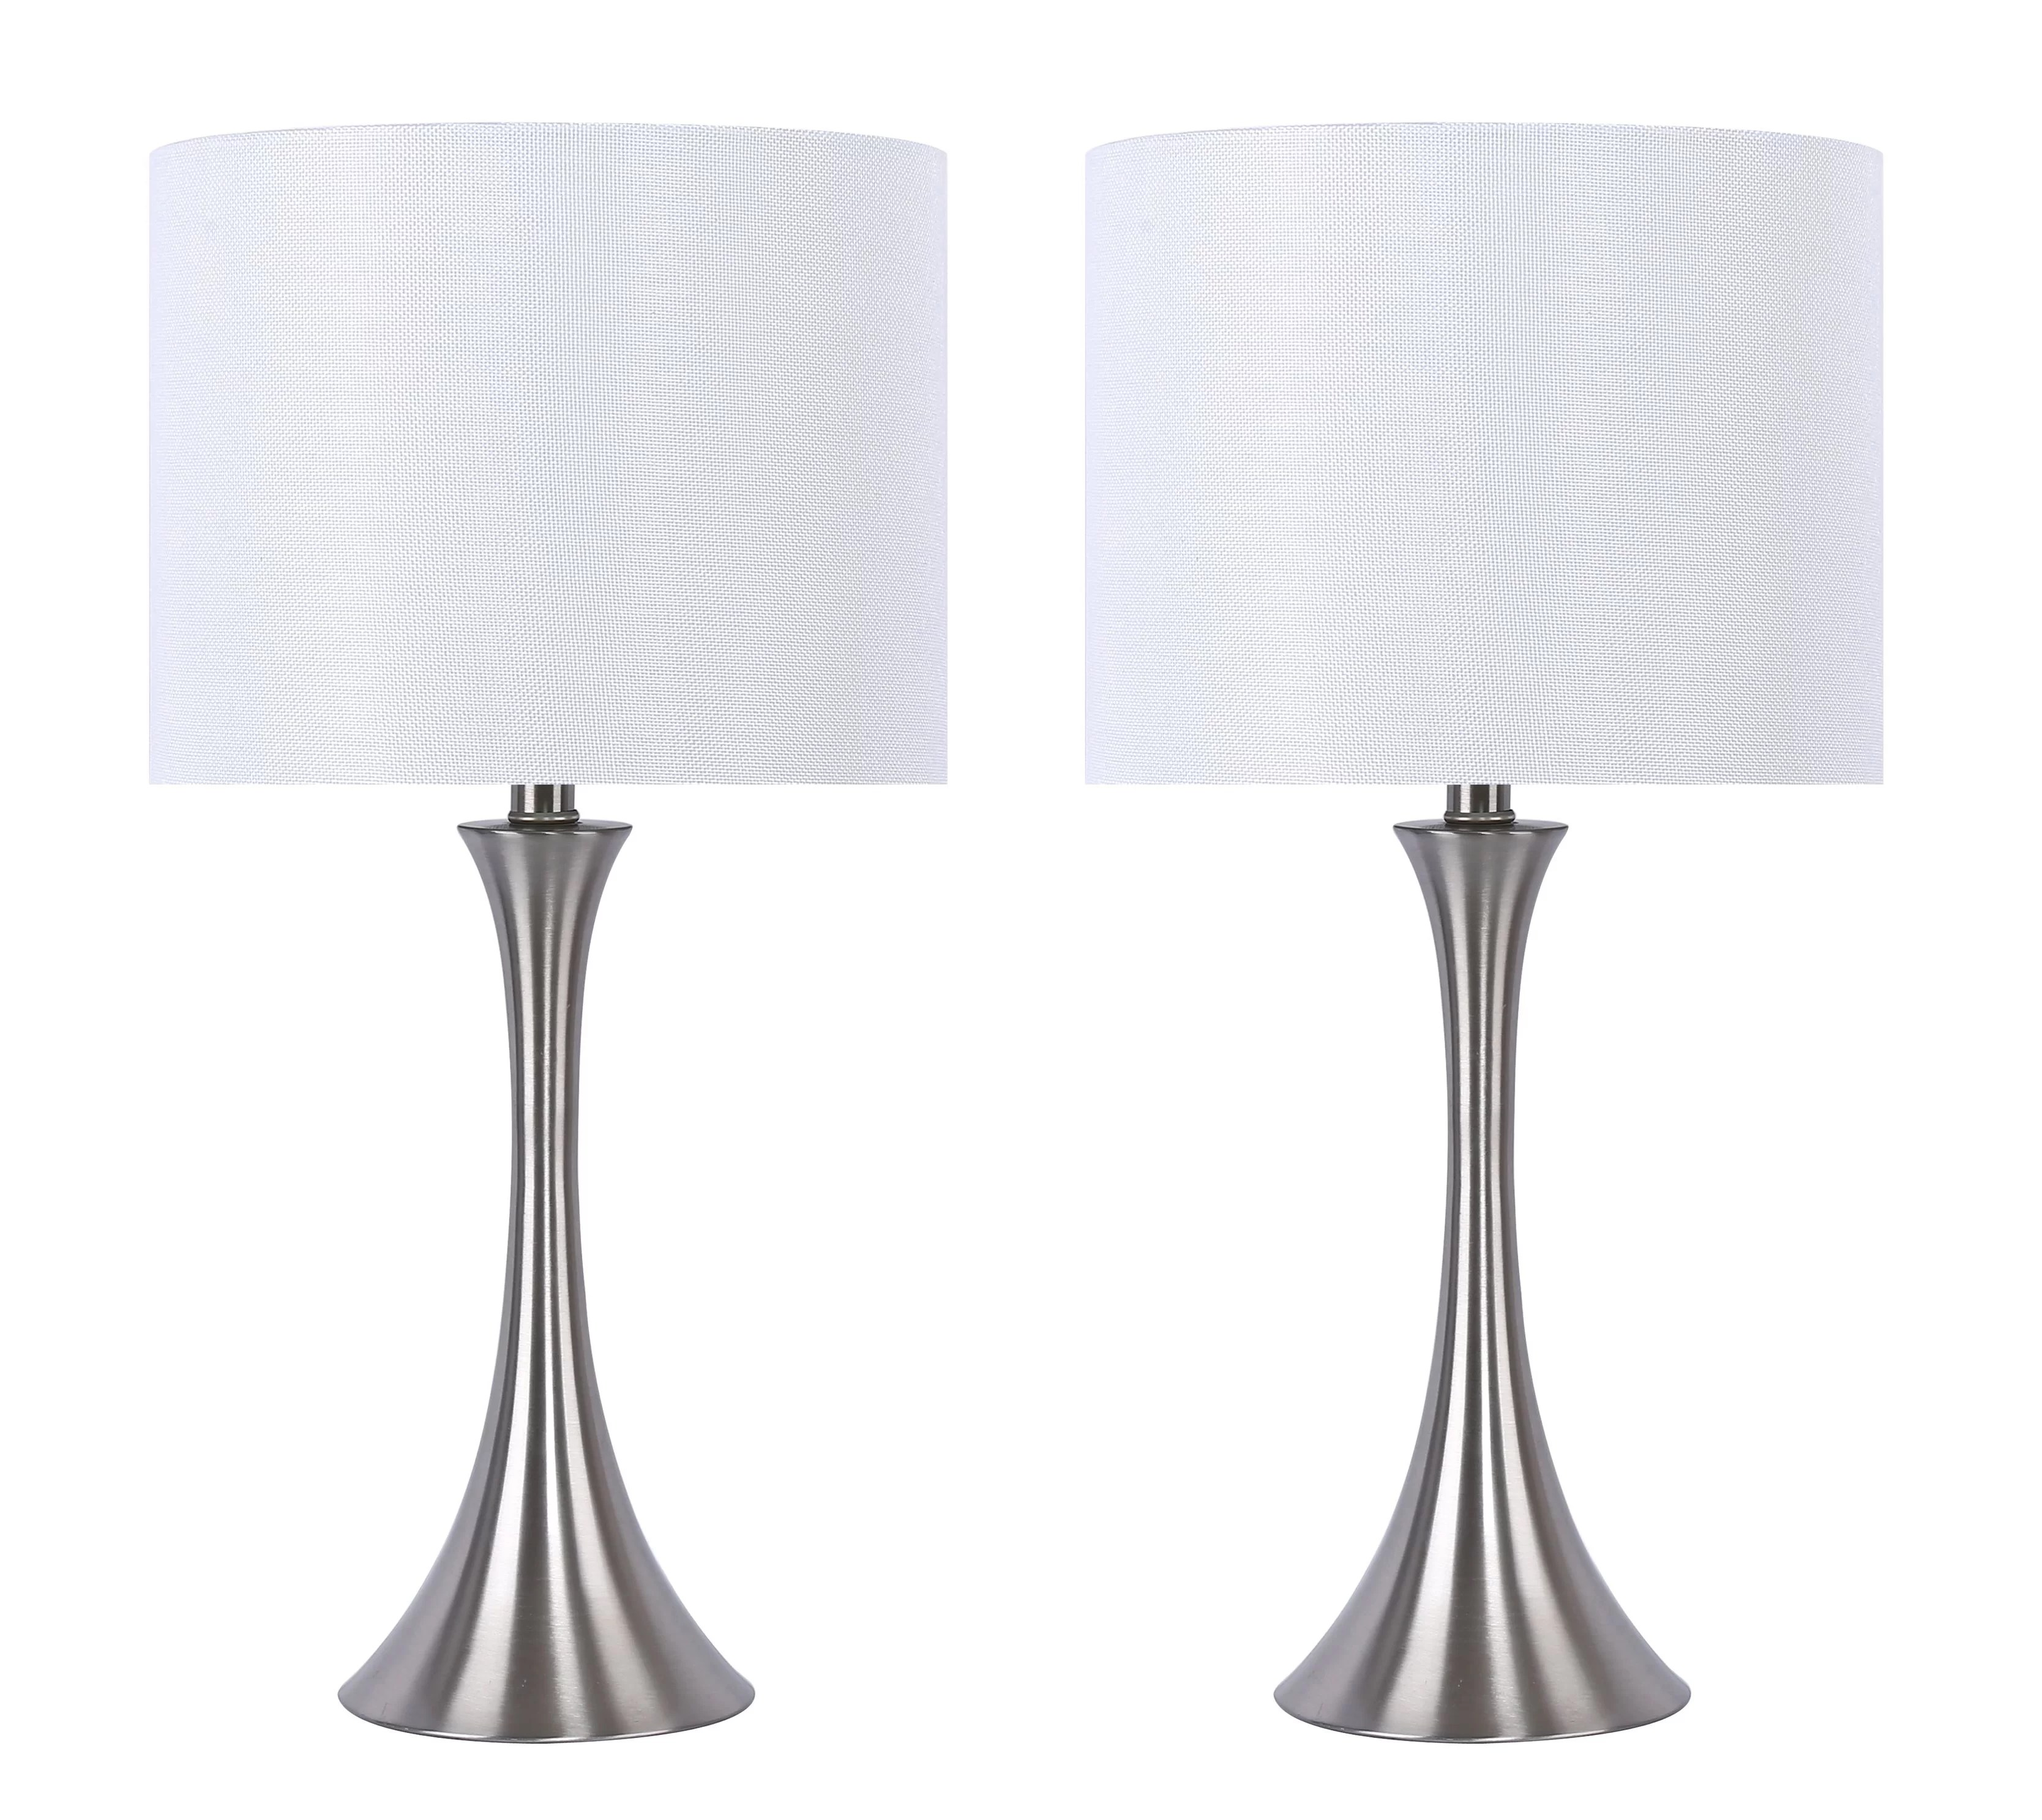 Orren Ellis Lapoint 24 25 Brushed Nickel Table Lamp Set Reviews Wayfair